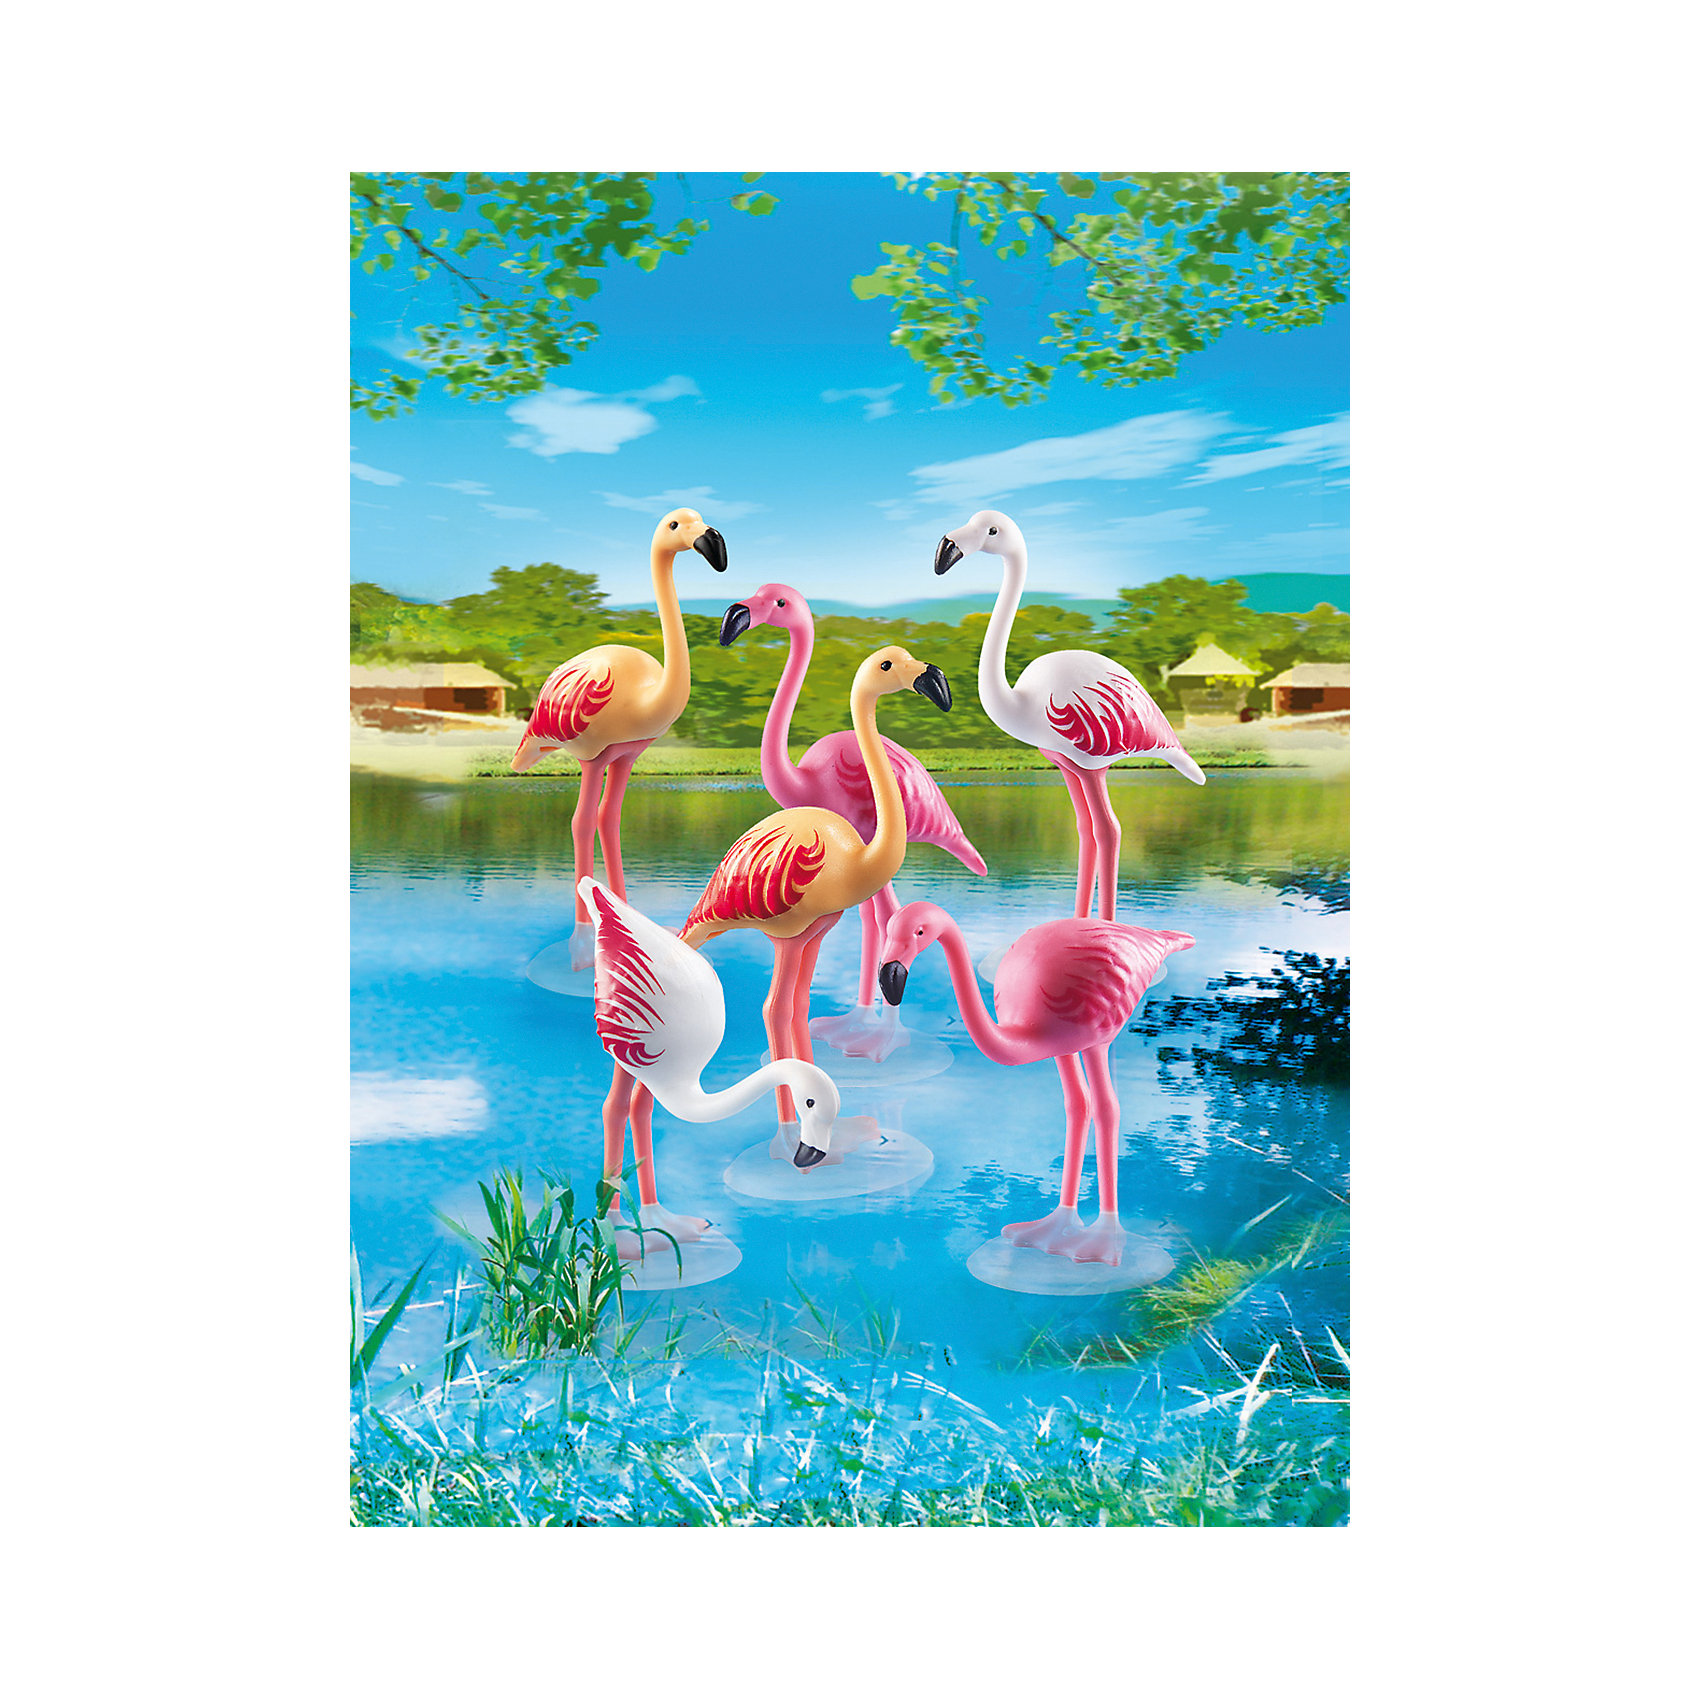 Зоопарк: Стая Фламинго, PLAYMOBIL<br><br>Ширина мм: 174<br>Глубина мм: 119<br>Высота мм: 35<br>Вес г: 37<br>Возраст от месяцев: 48<br>Возраст до месяцев: 120<br>Пол: Унисекс<br>Возраст: Детский<br>SKU: 3786377